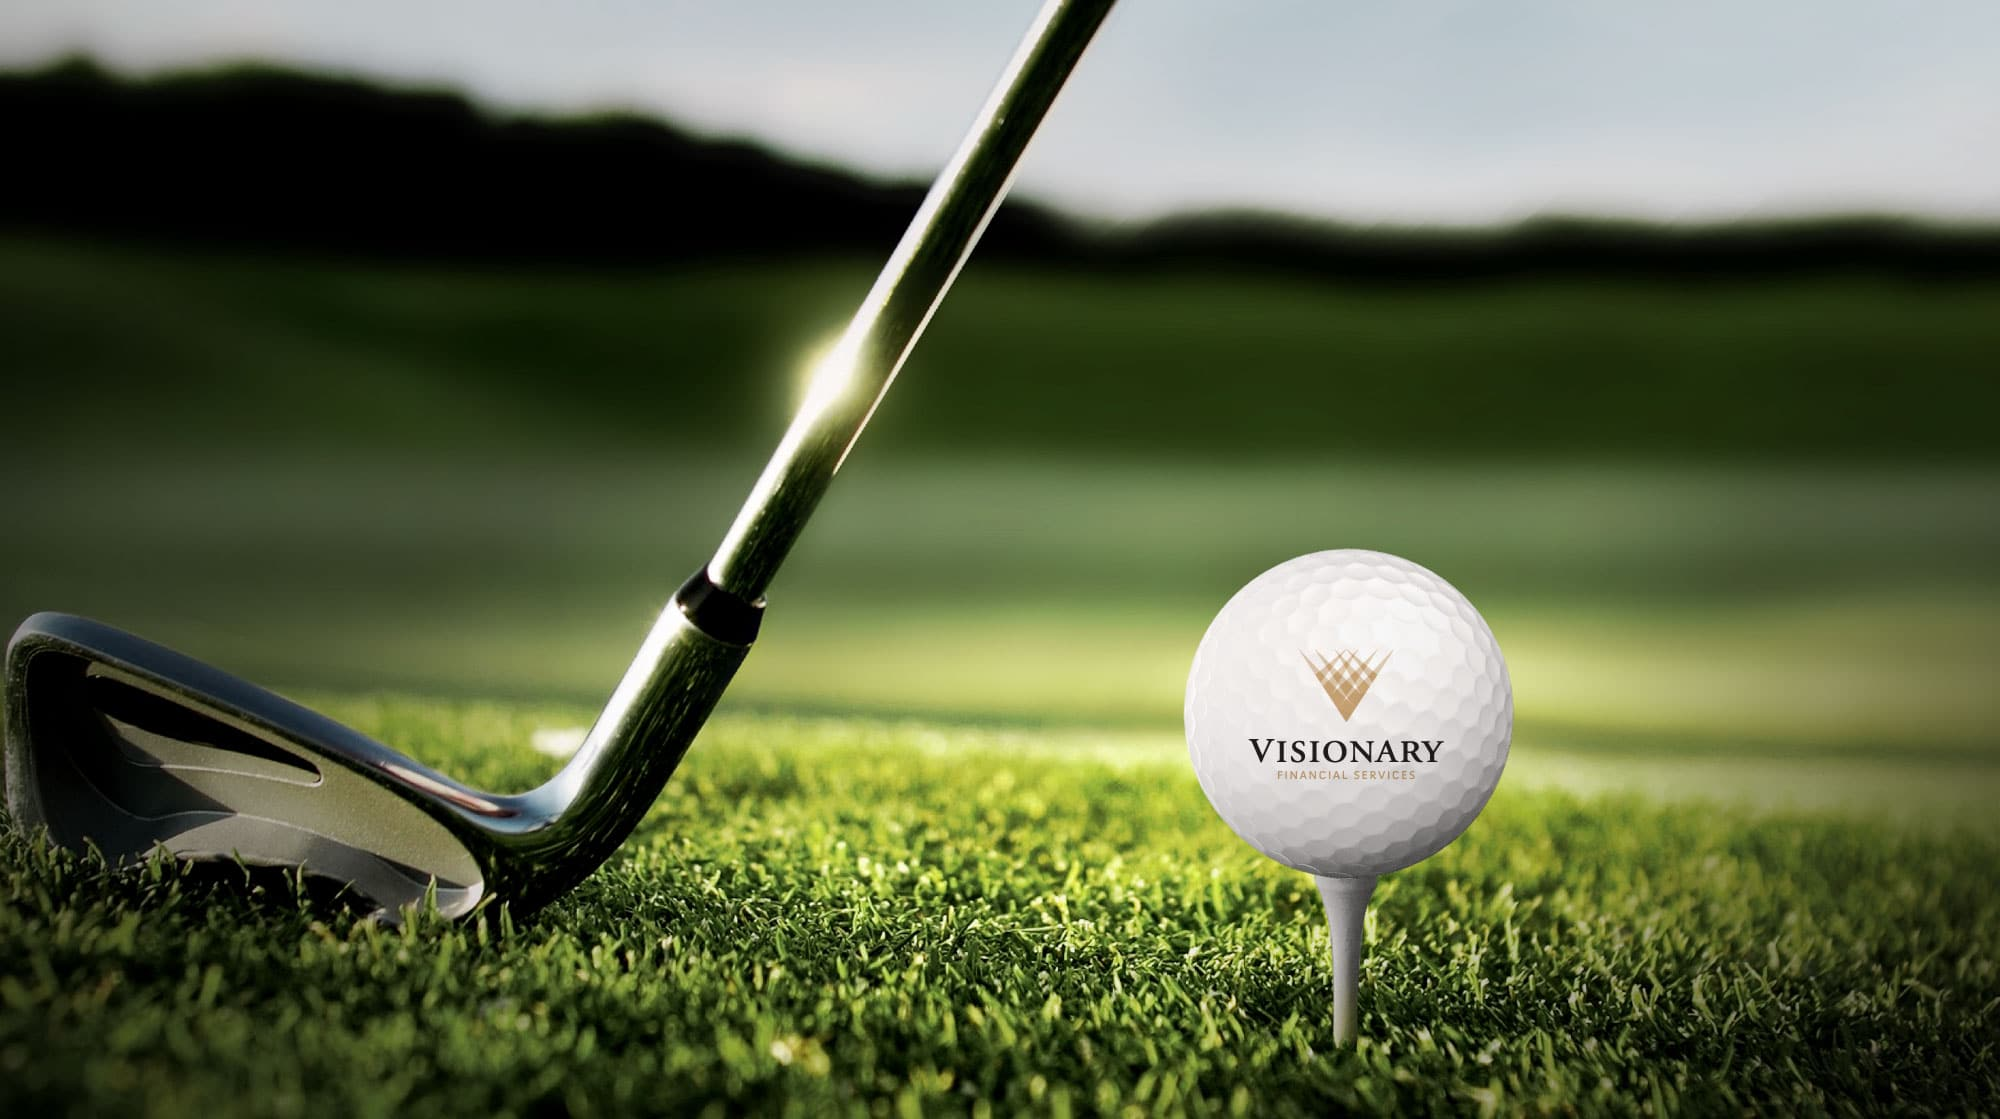 Visionary Logo Branded Golfball